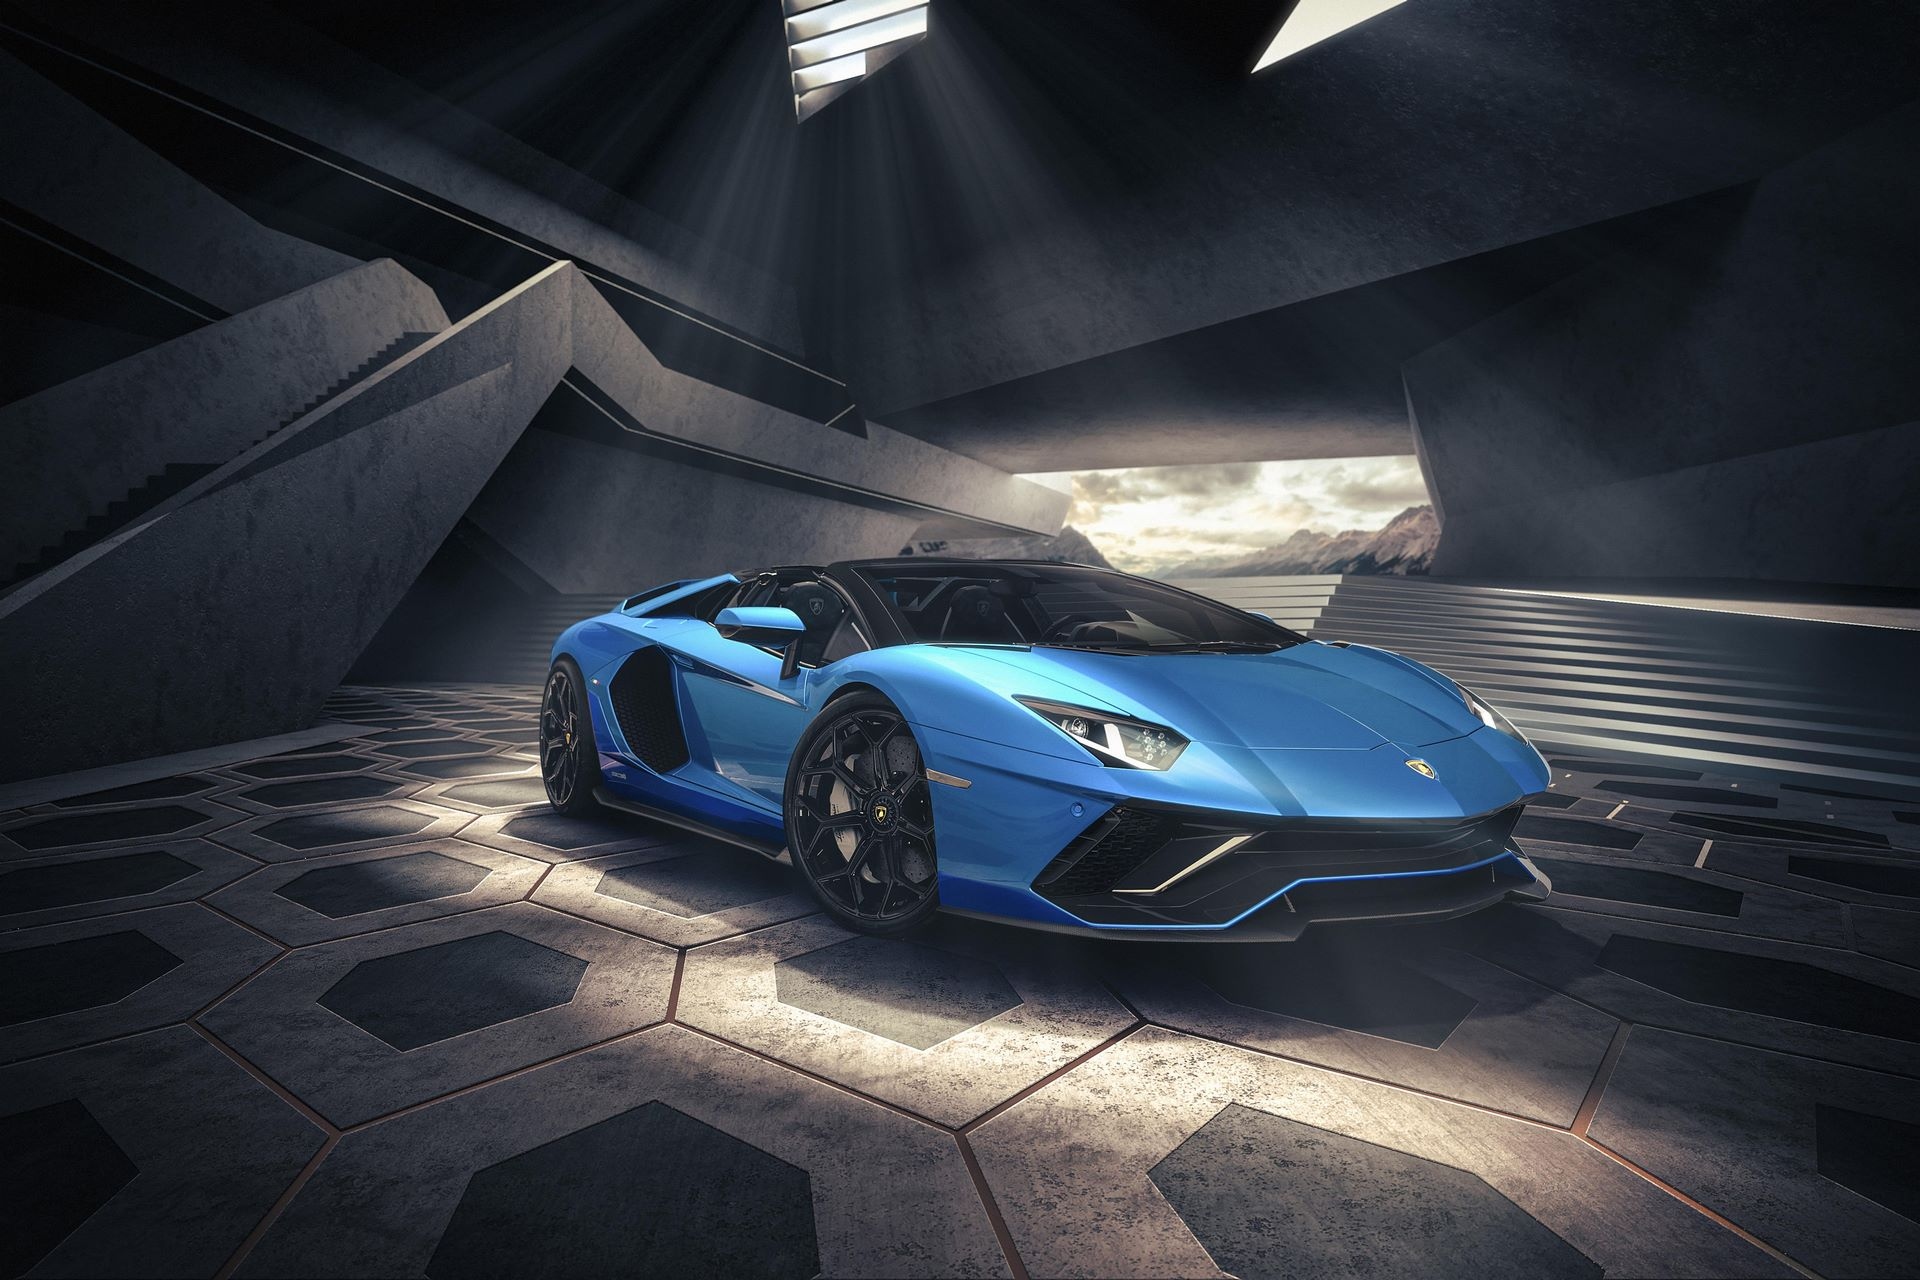 Lamborghini-Aventador-LP780-4-Ultimae-49